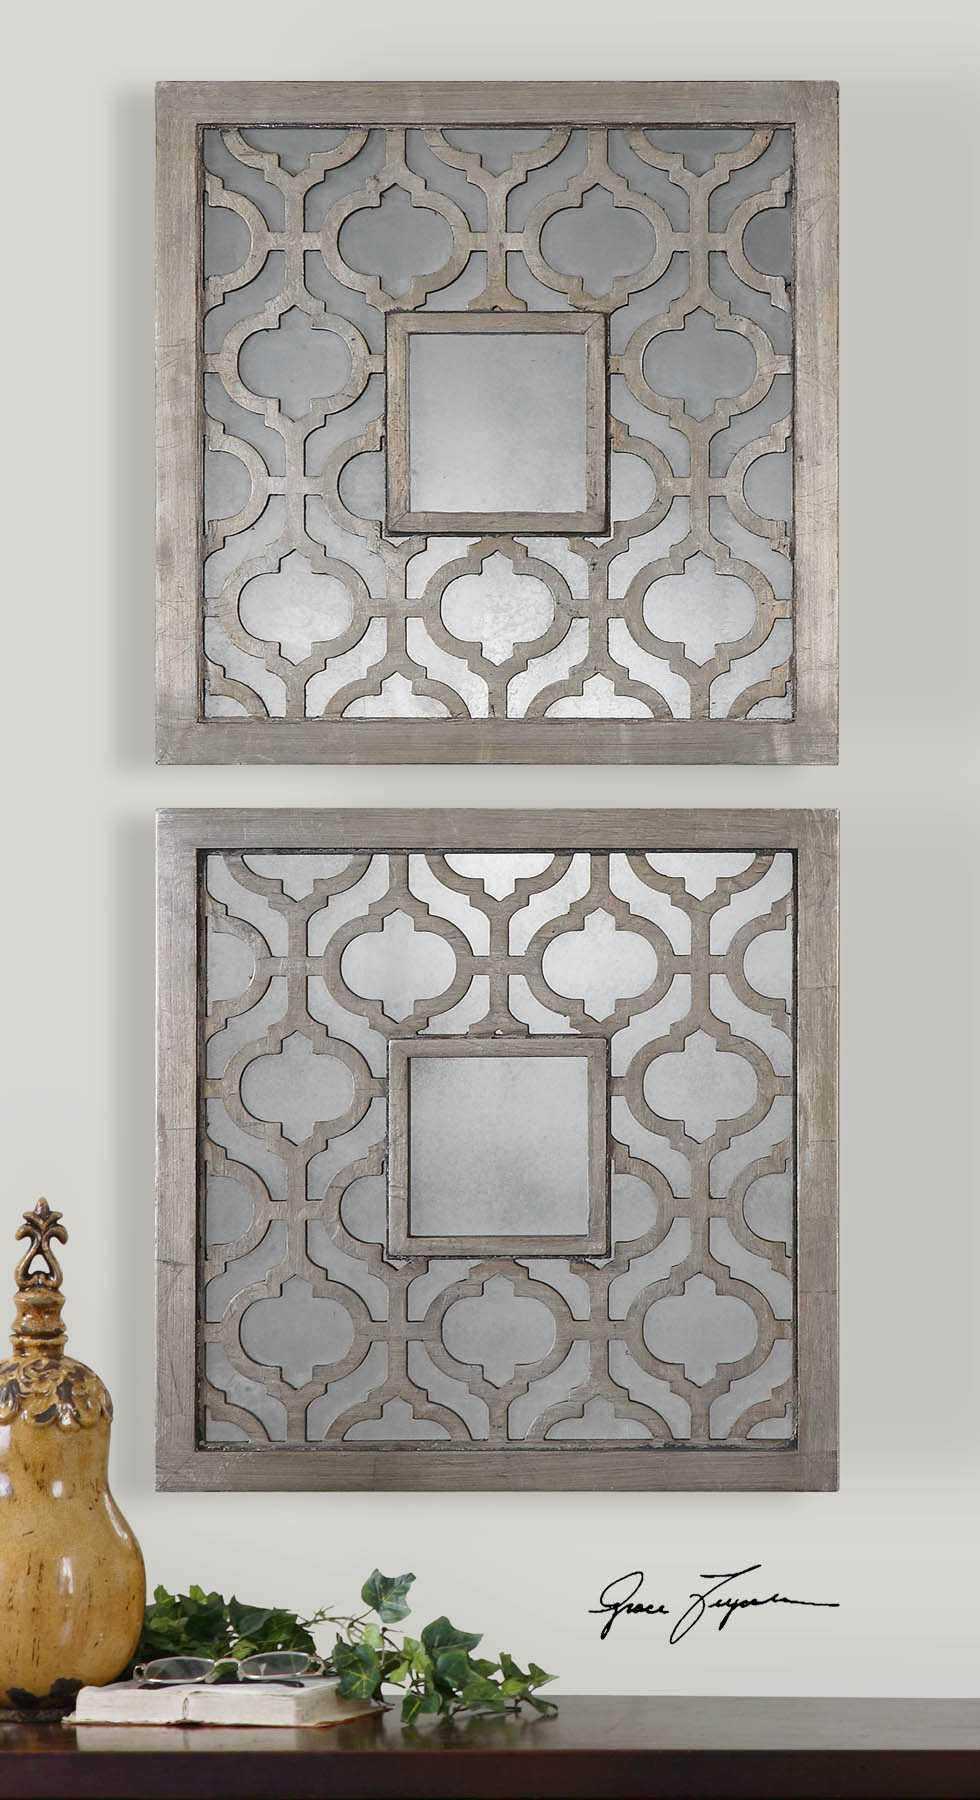 Uttermost Sorbolo 20 x 20 Squares Decorative Wall Mirrors ...